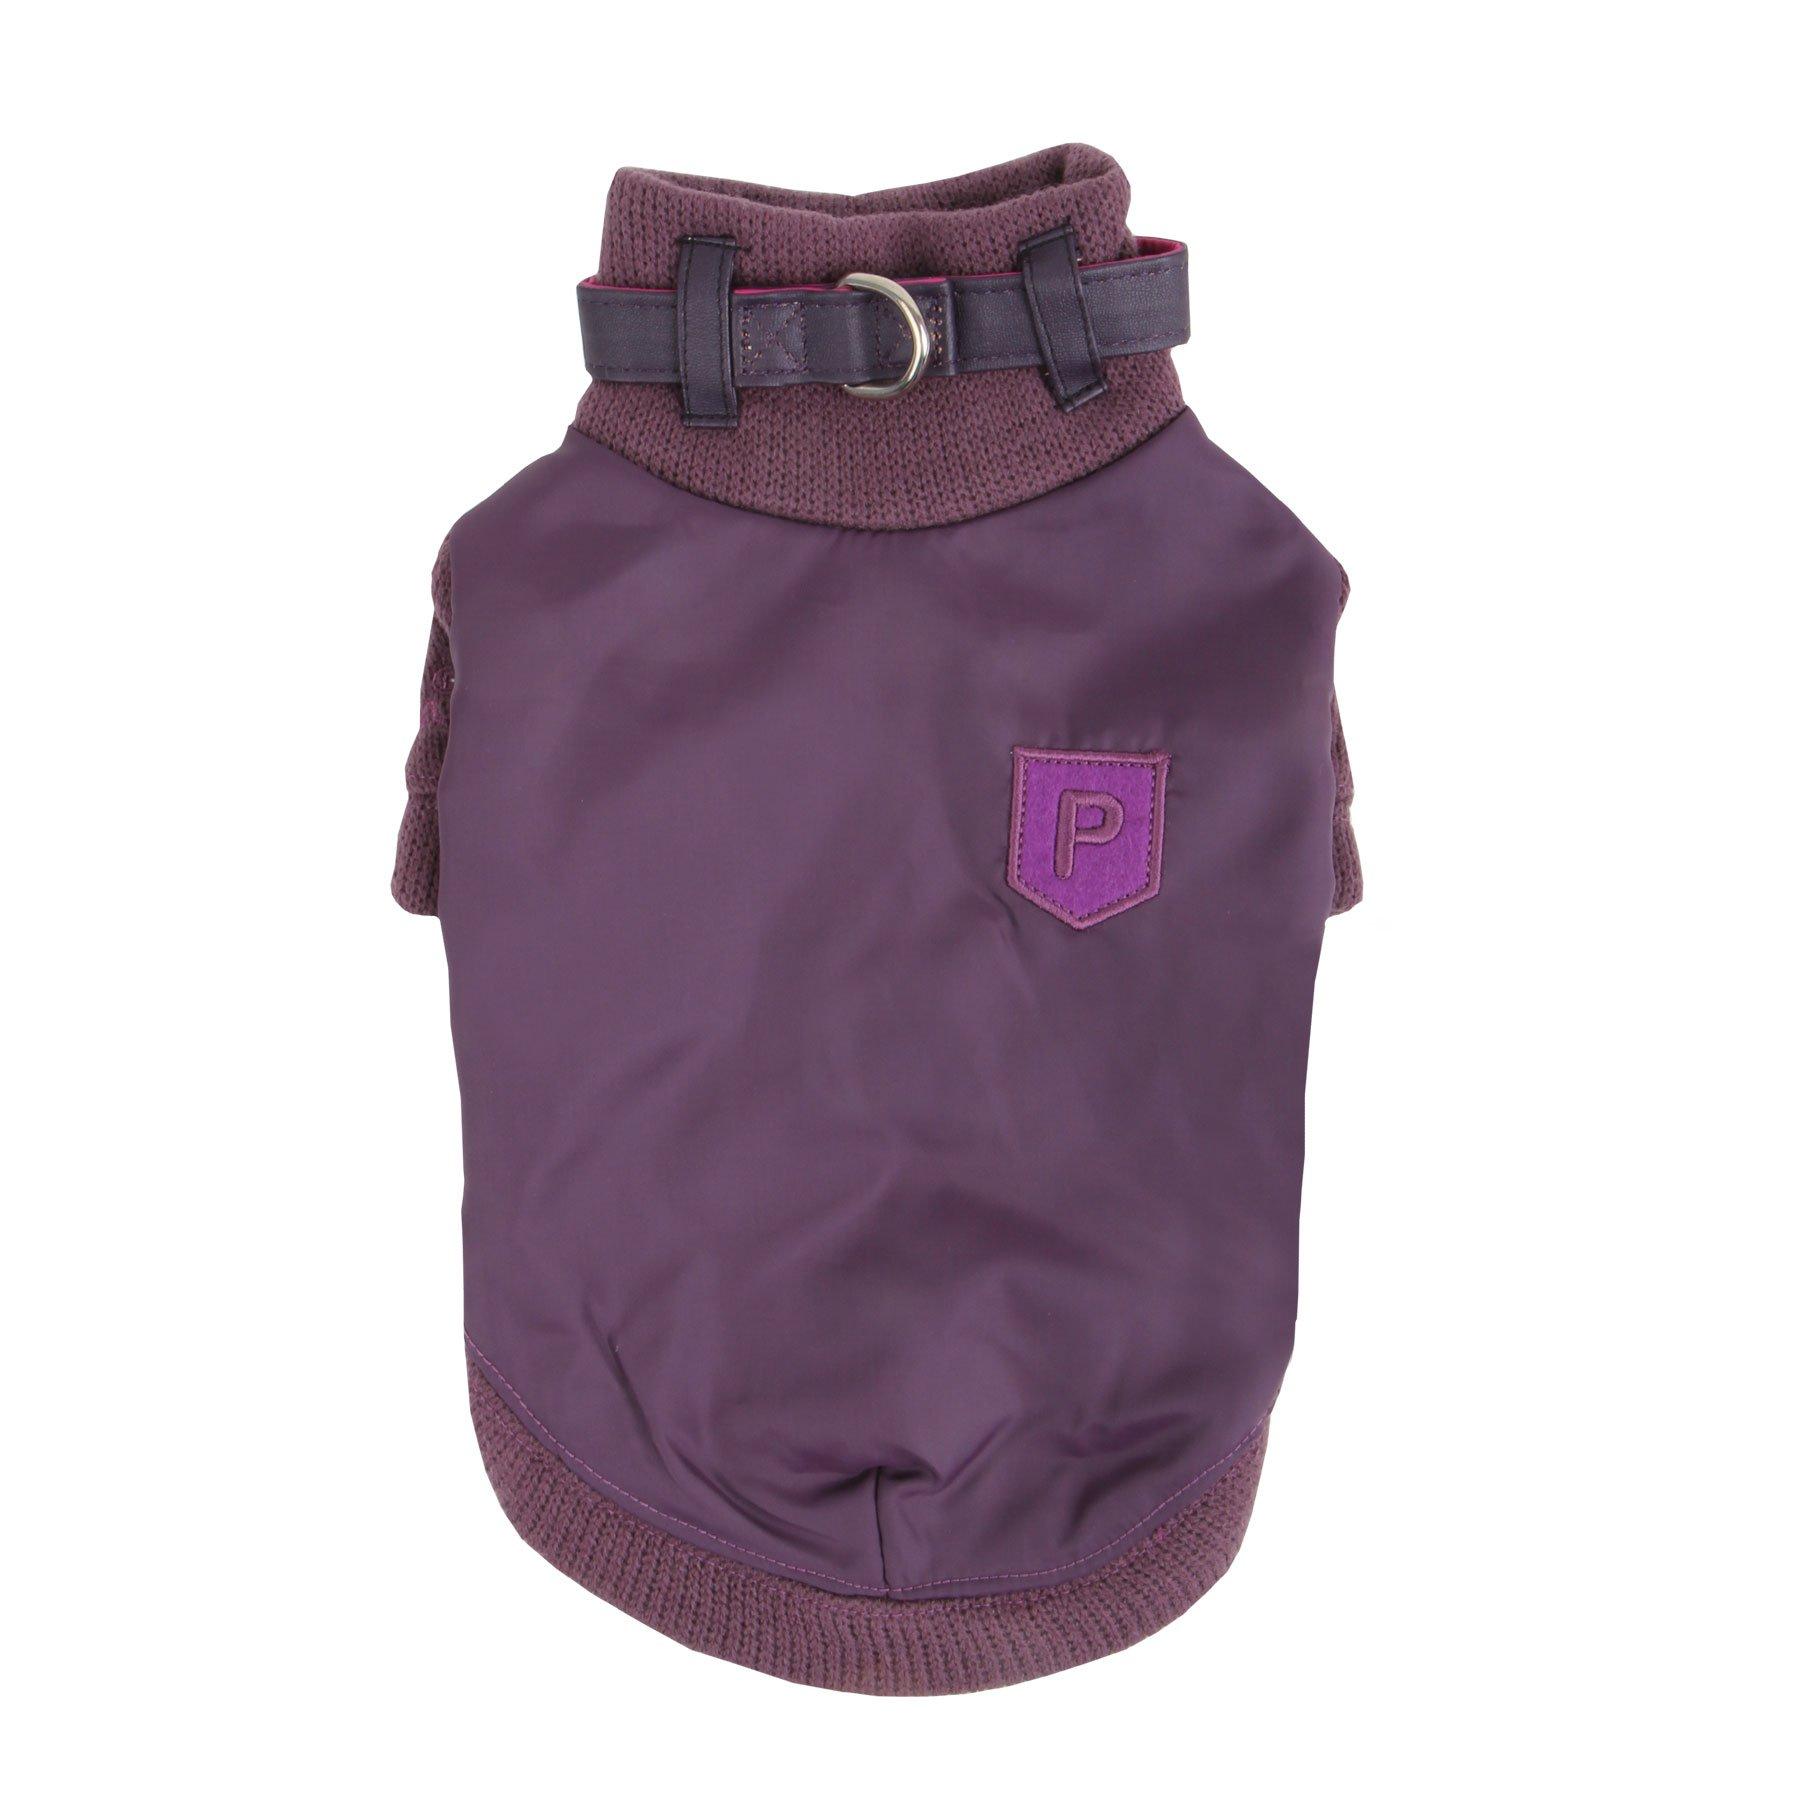 Puppia Tender Turtle Neck Dog Sweater, Small, Purple